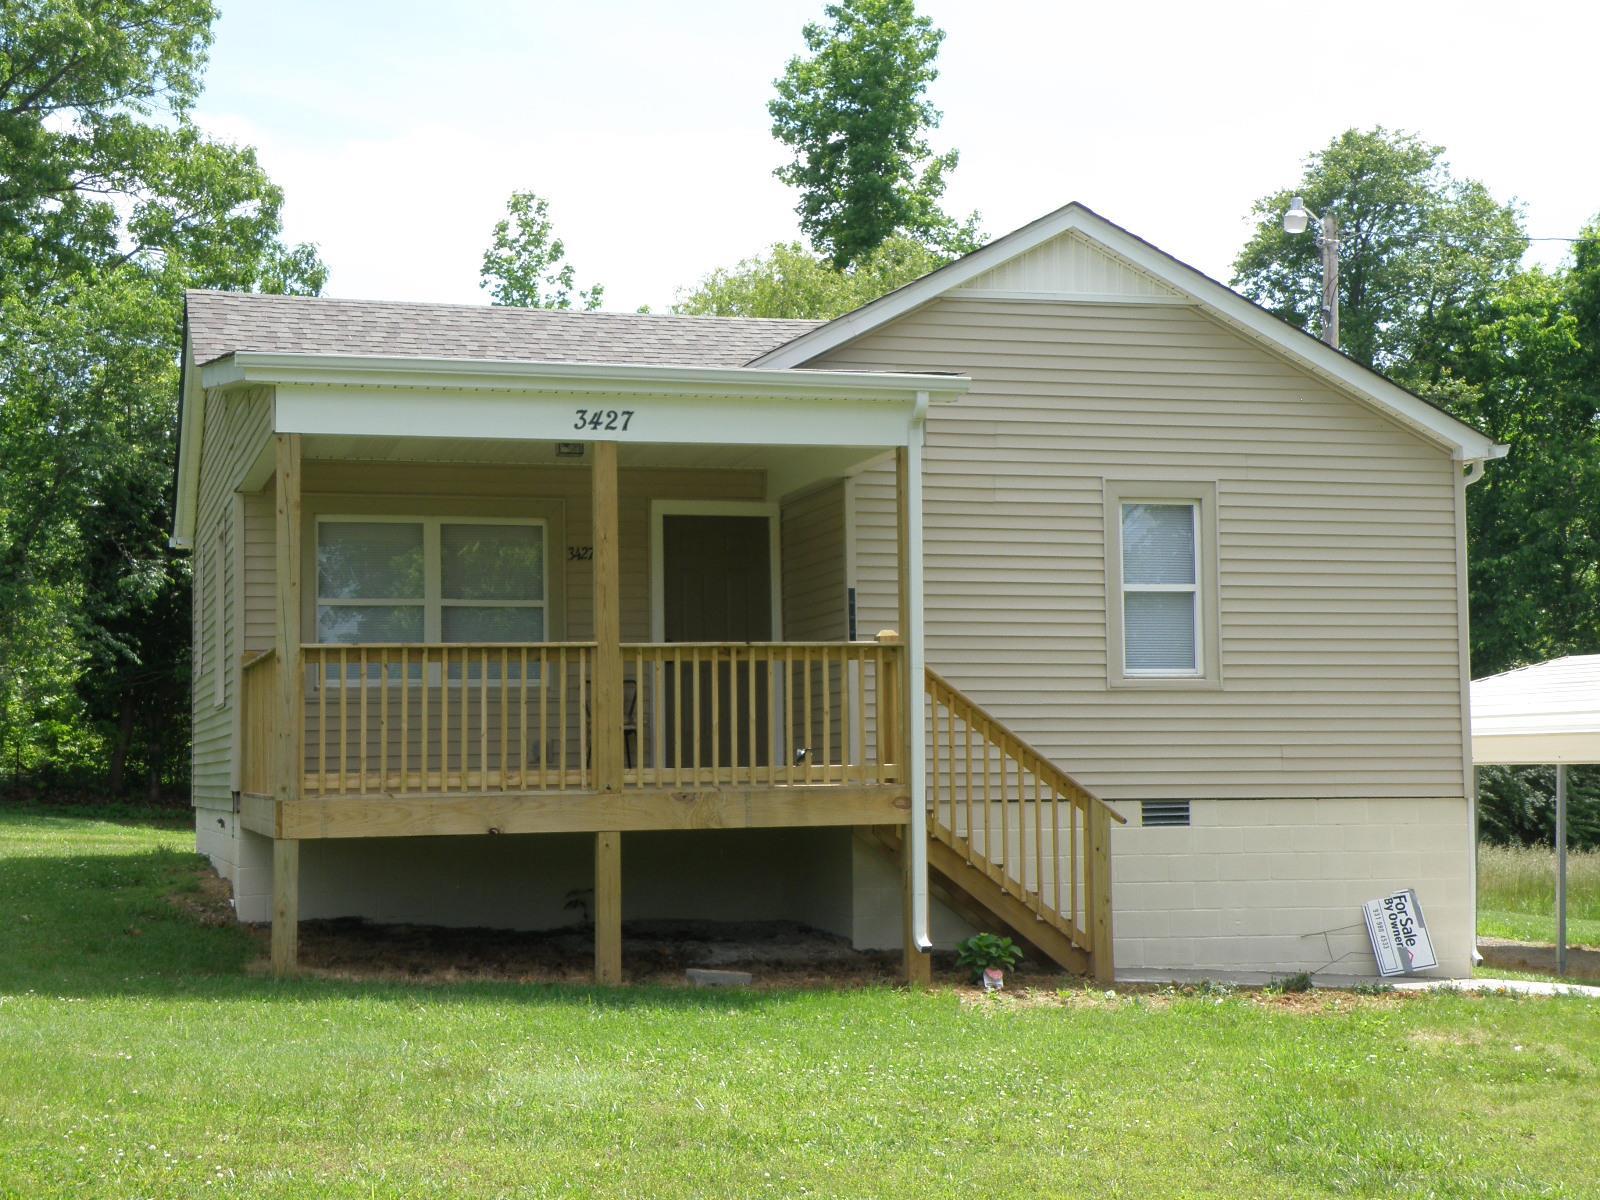 3427 Lake Rd, Woodlawn, TN 37191